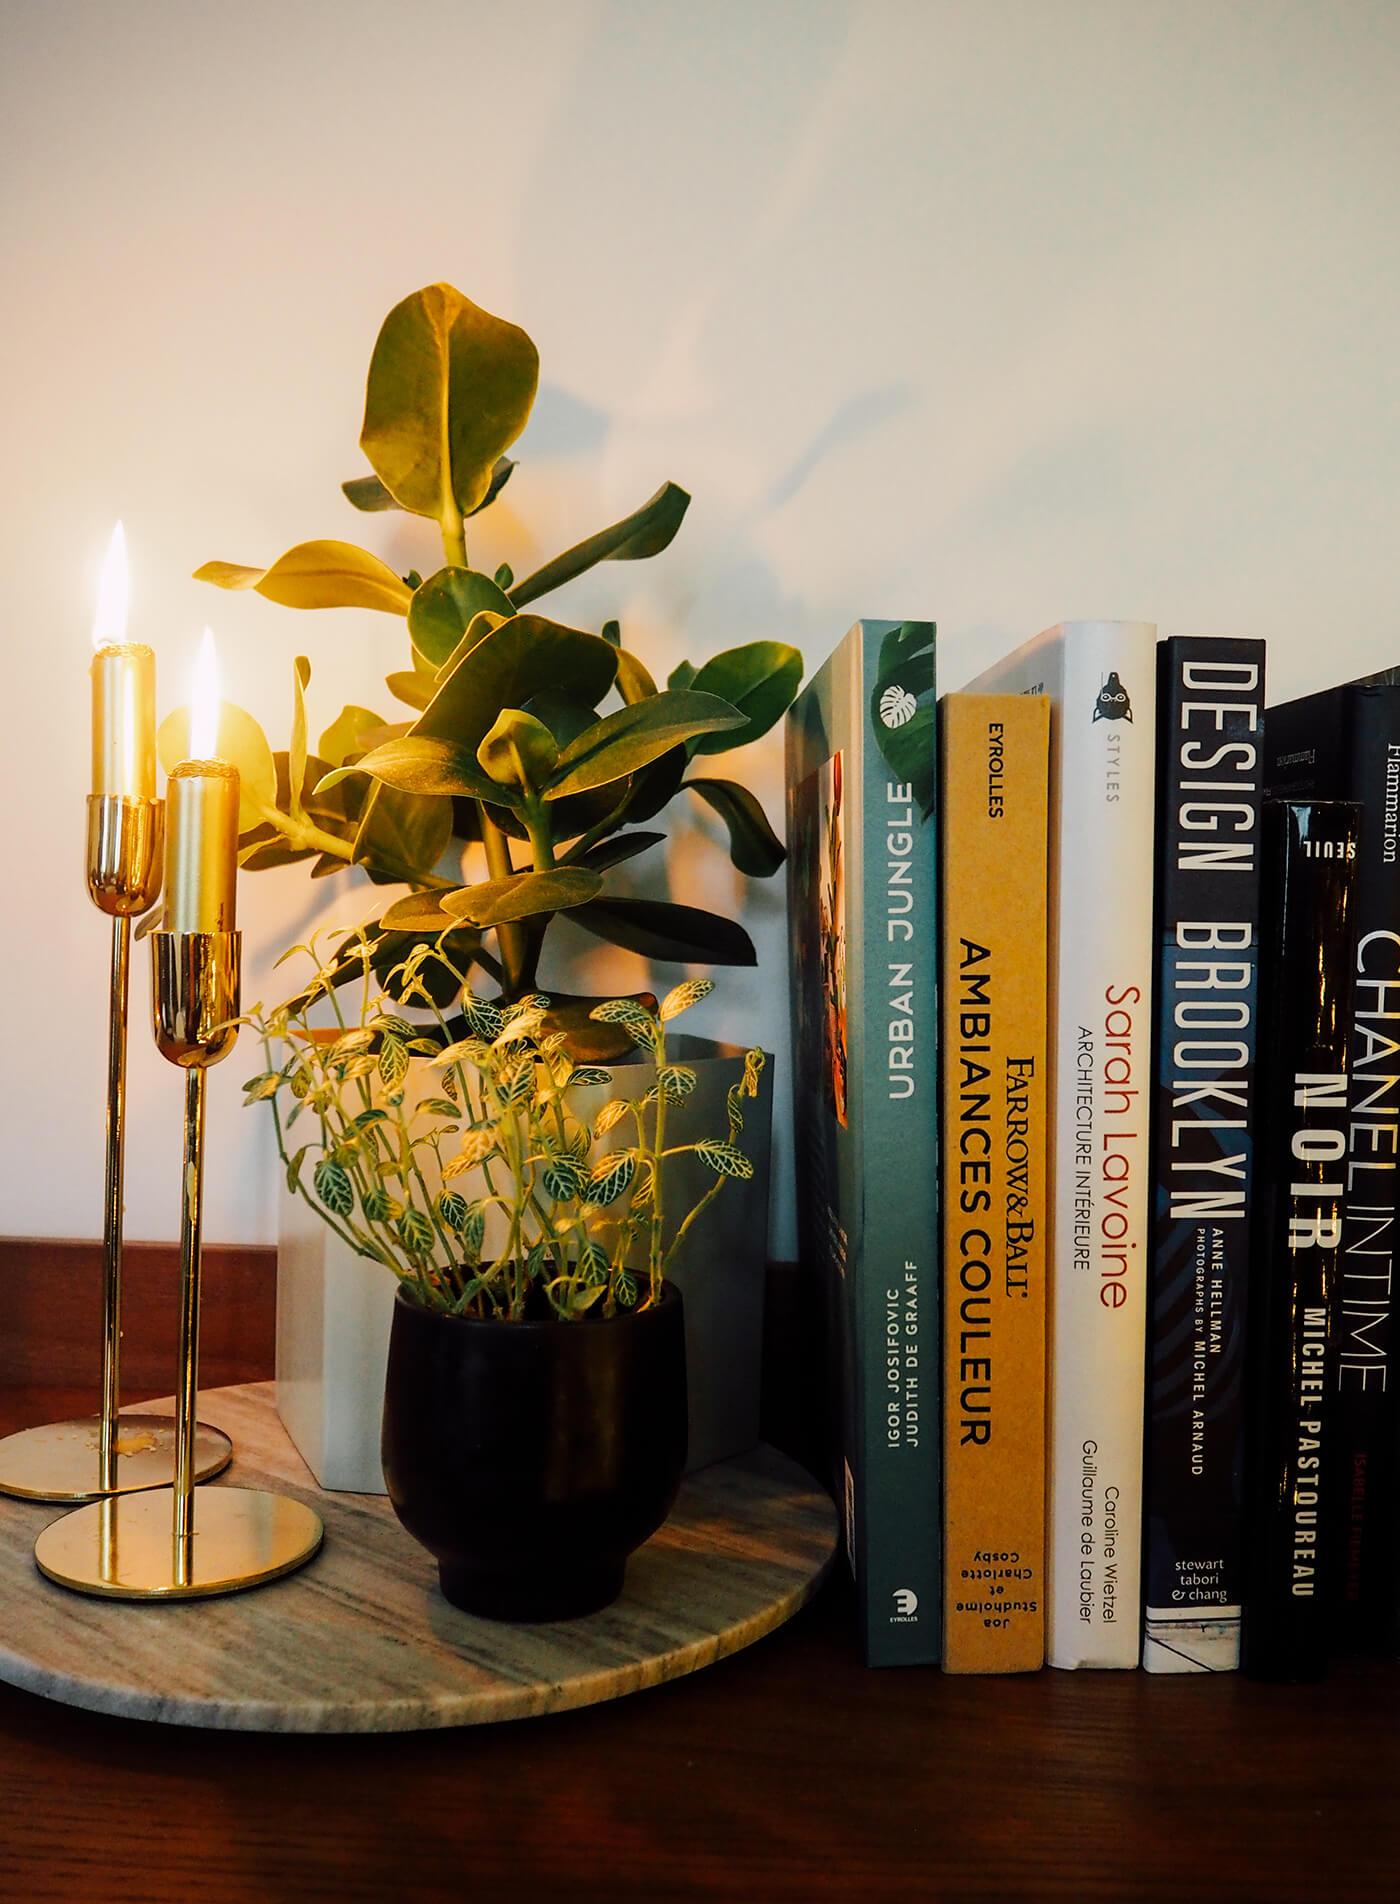 decorer appartement noel sapin artificiel balsam hill frenchyfancy 7 frenchy fancy. Black Bedroom Furniture Sets. Home Design Ideas